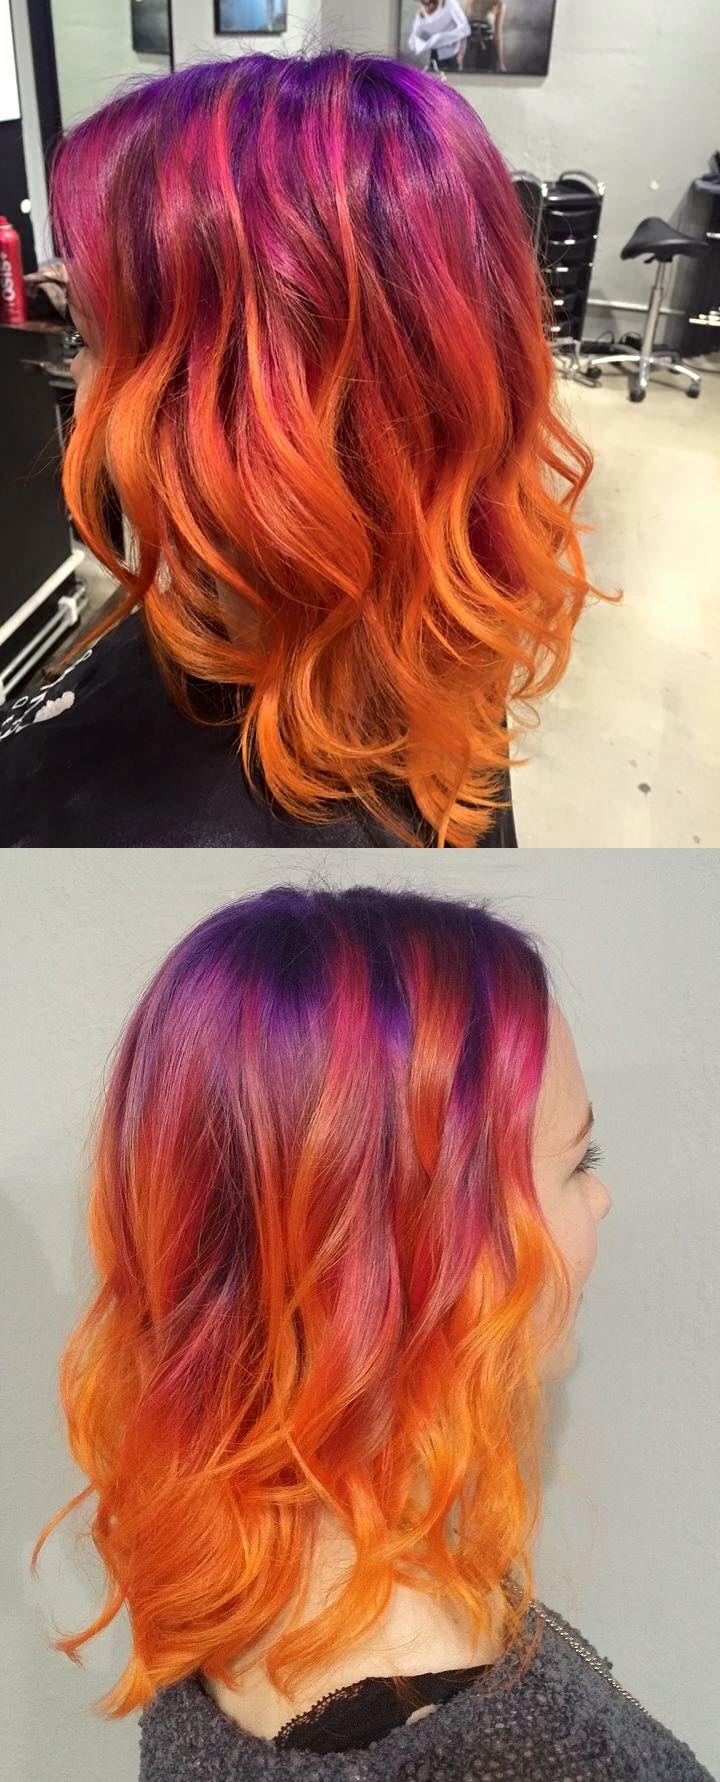 Sunset hair: Violet roots, hot pink and orange. Colour and cut by Vladimir Eroshenko at Cybtekk hair salon.